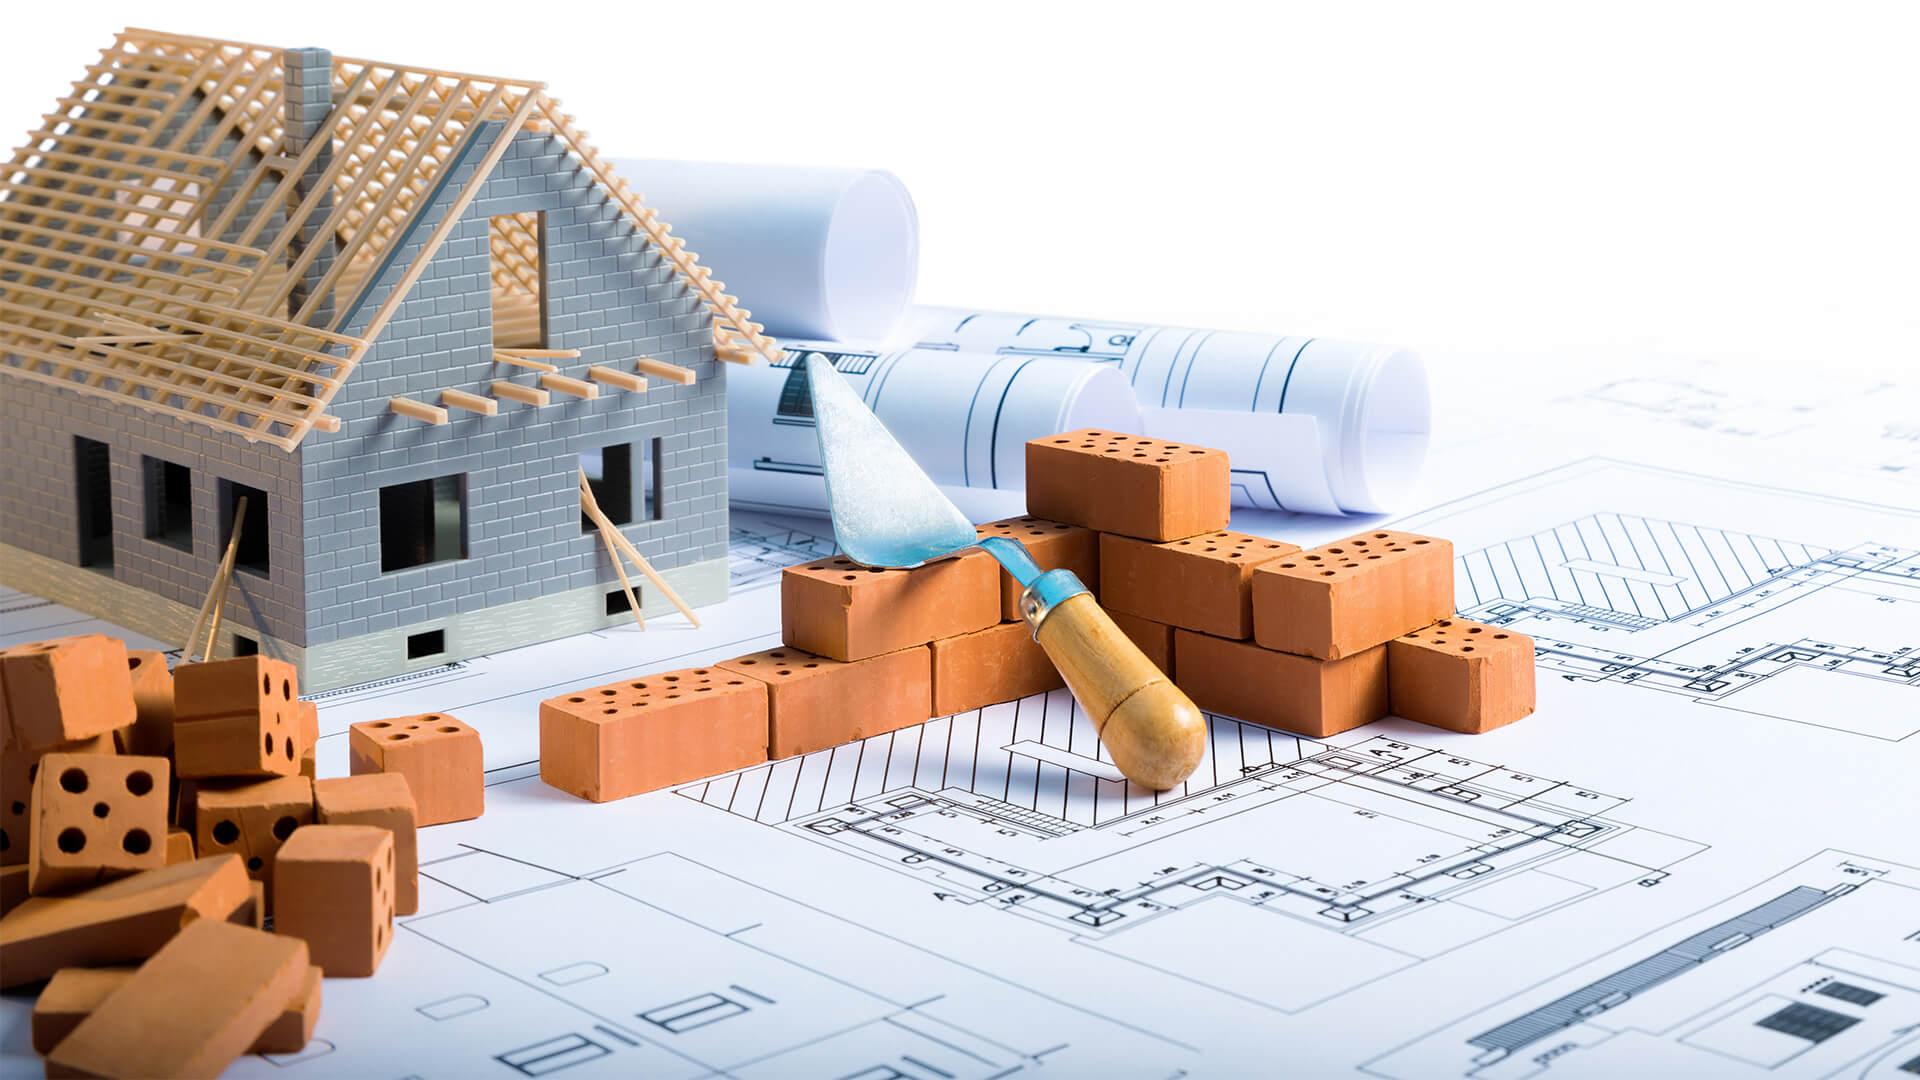 model house on blueprints, with miniature bricks